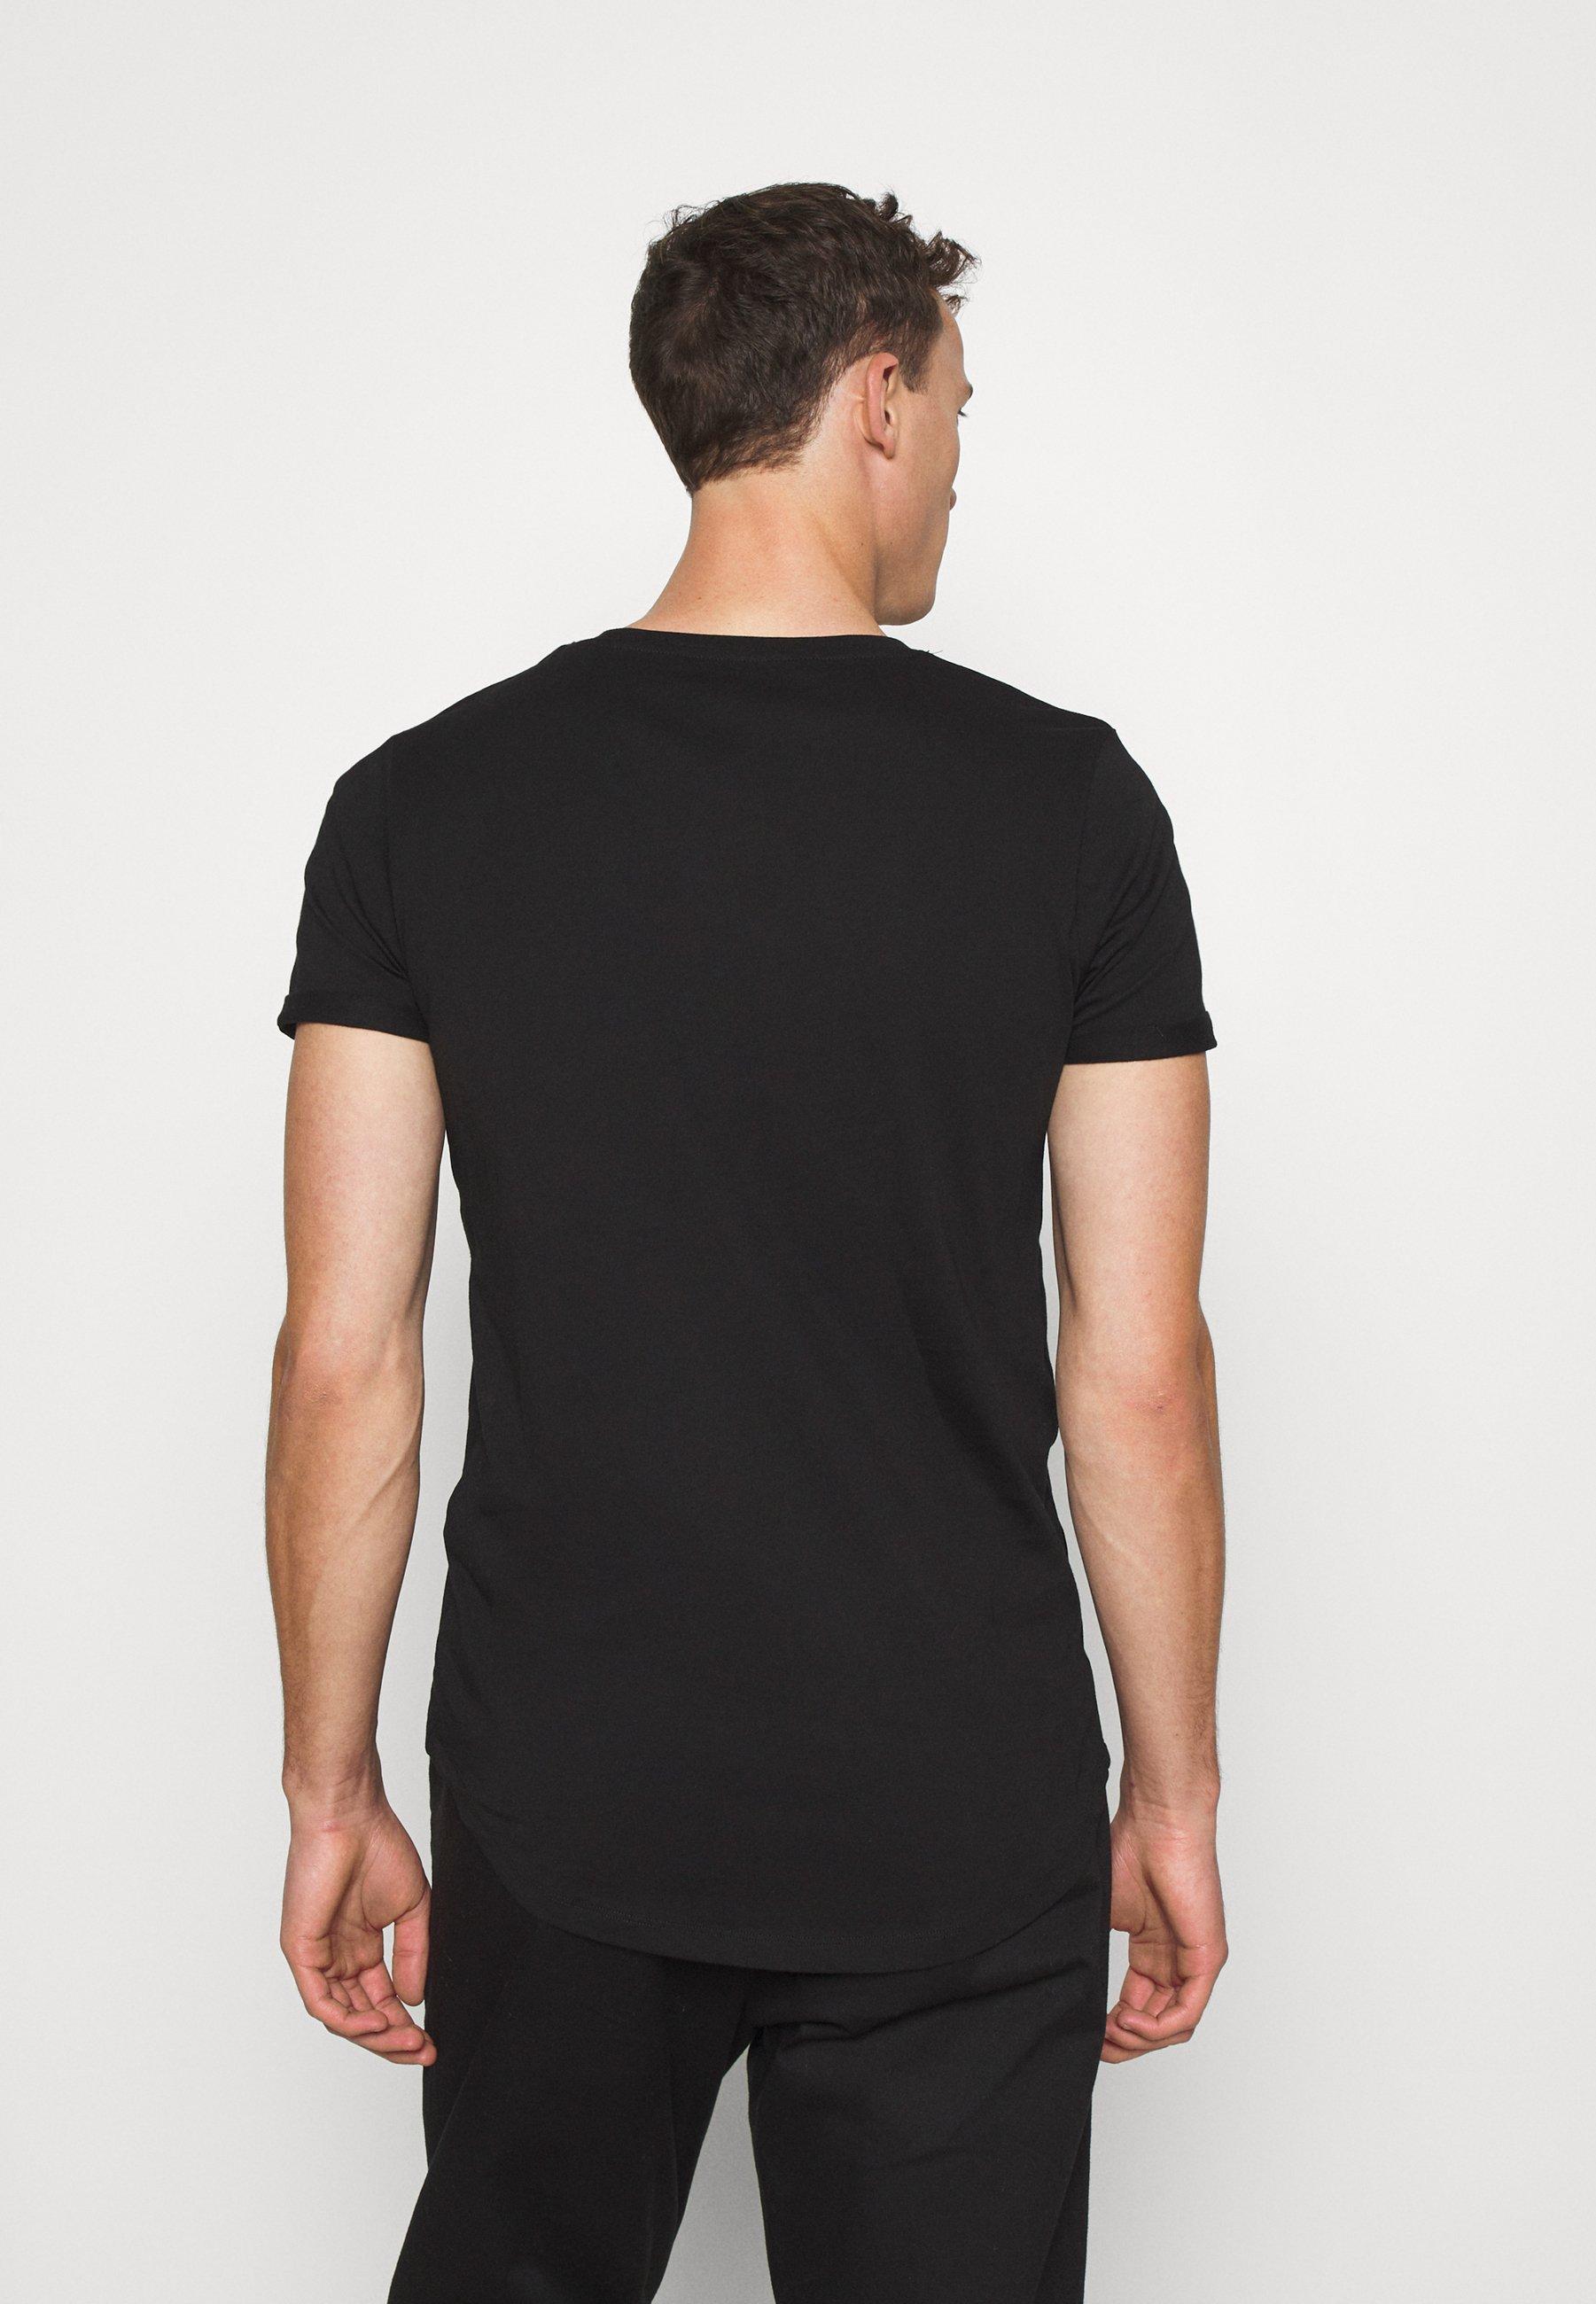 TOM TAILOR DENIM LONG BASIC WITH LOGO - Basic T-shirt - black S4opu